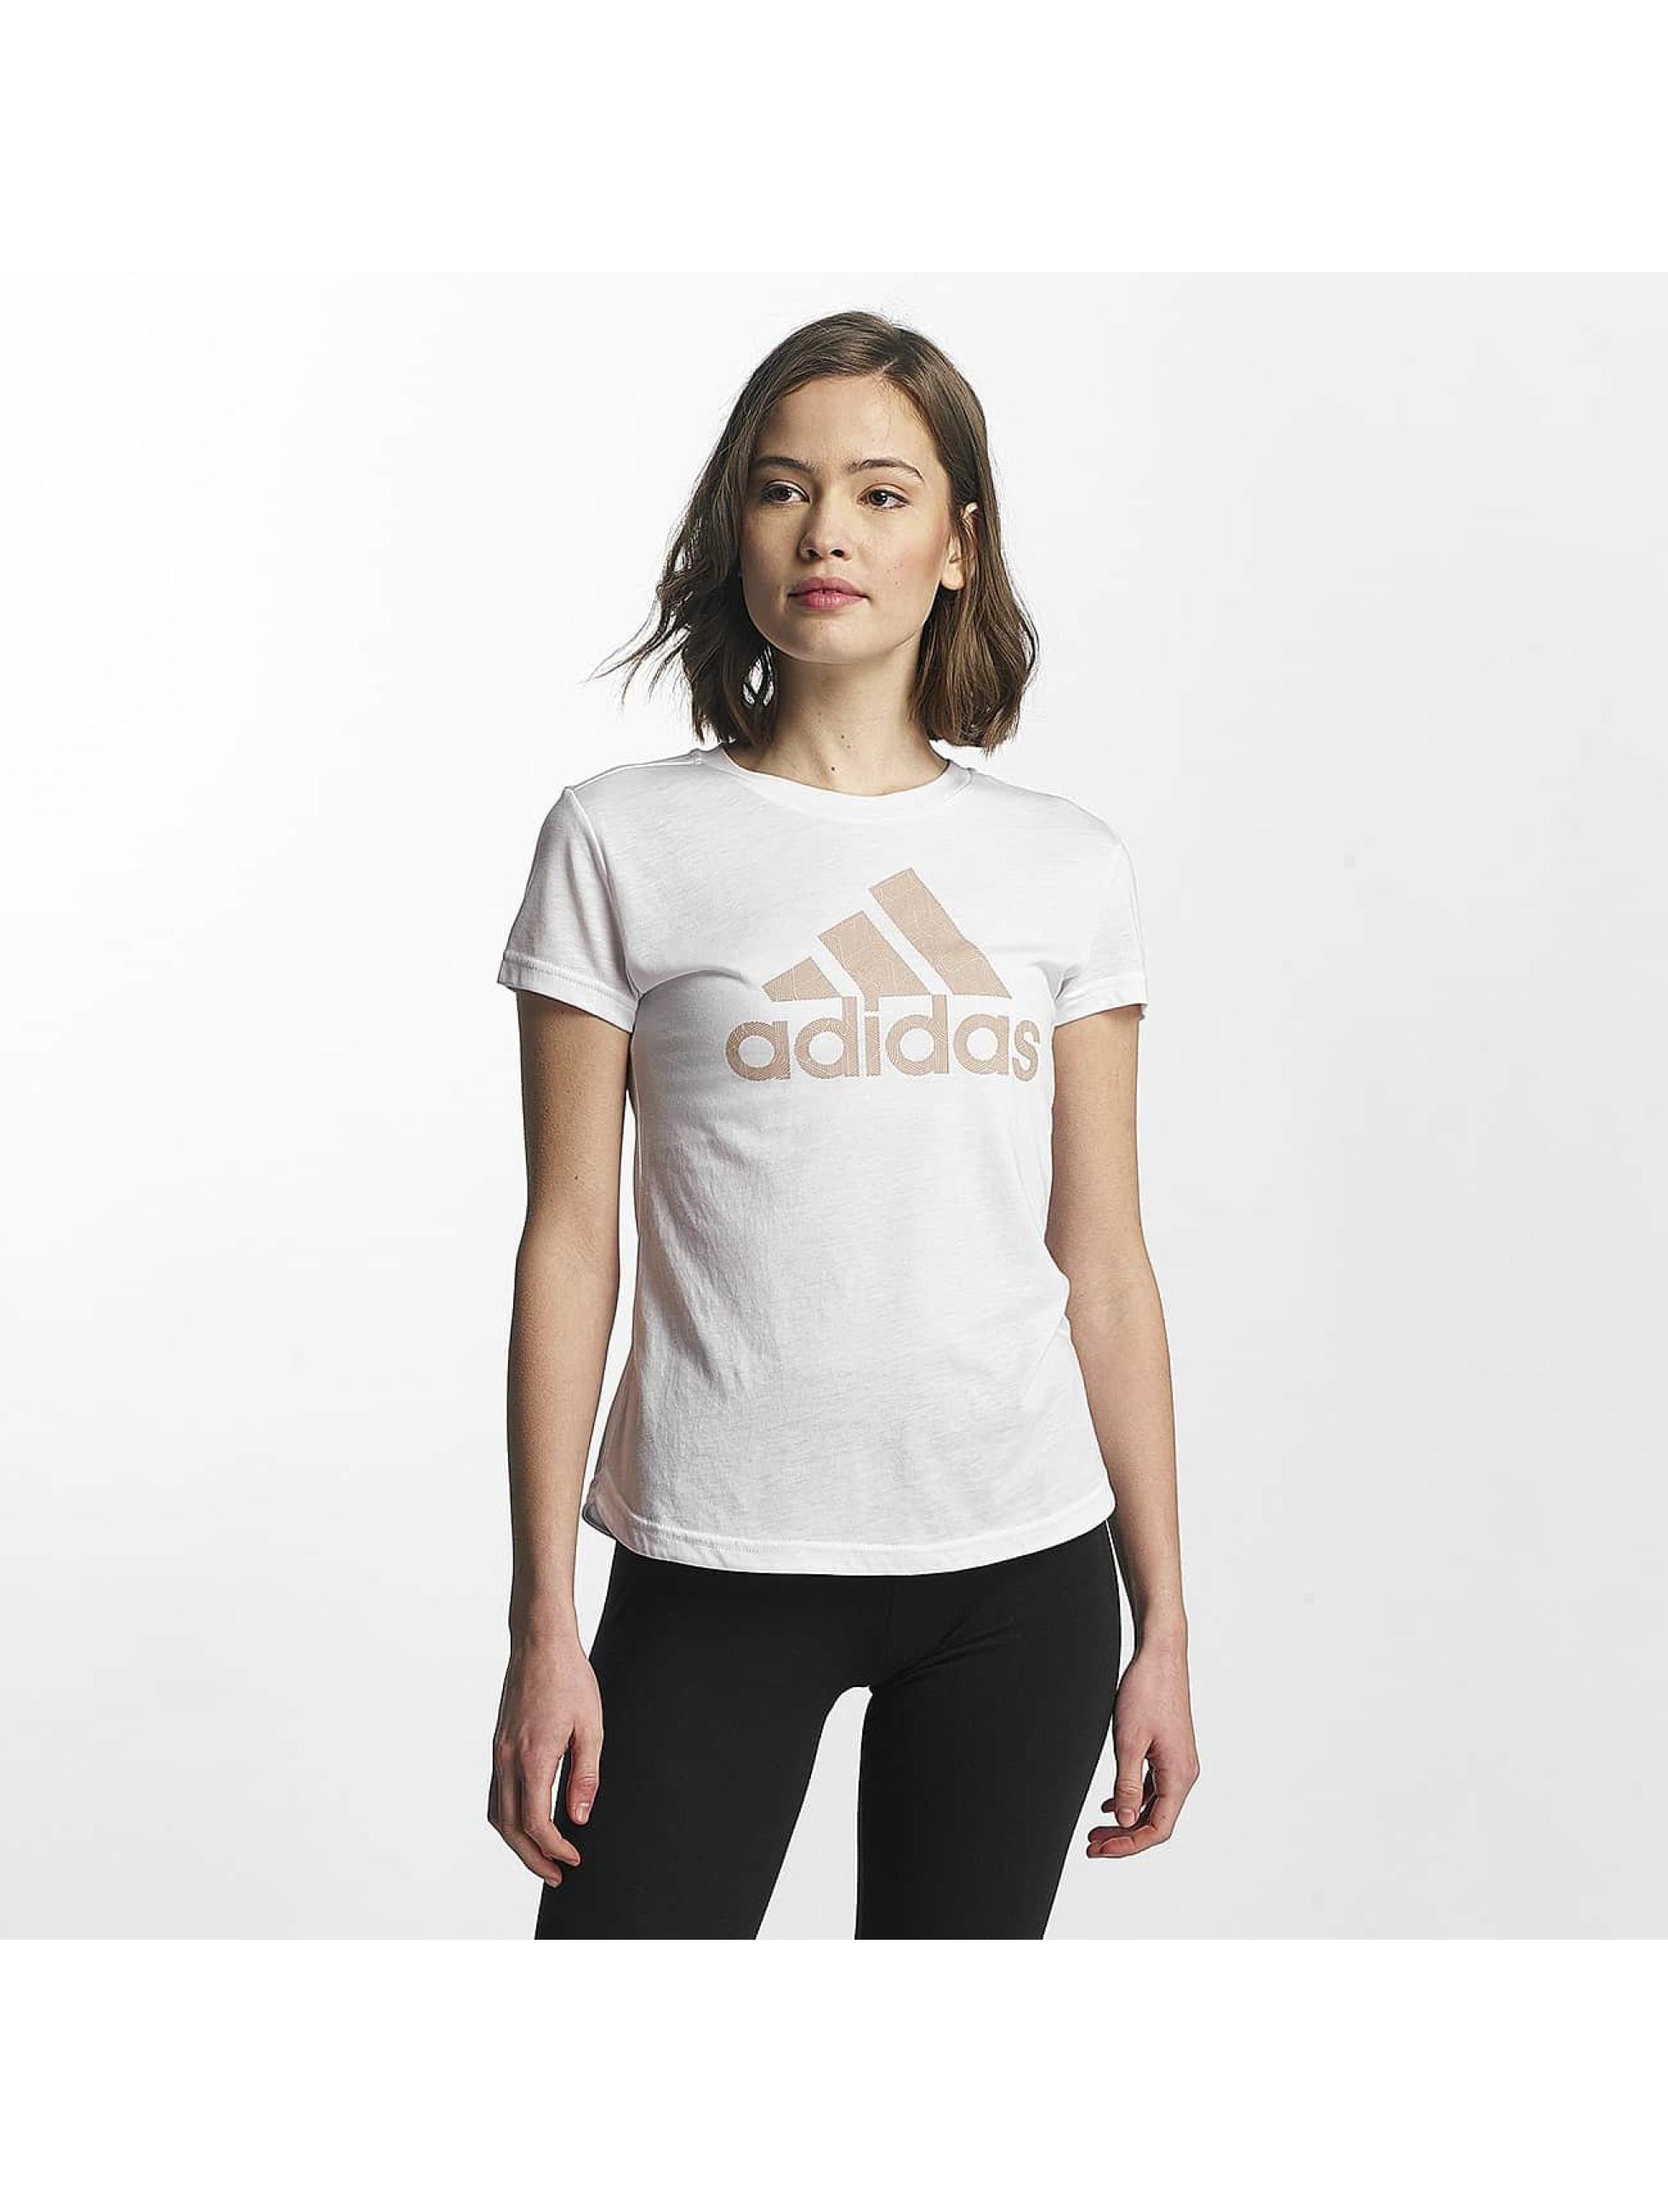 adidas Performance t-shirt Training wit